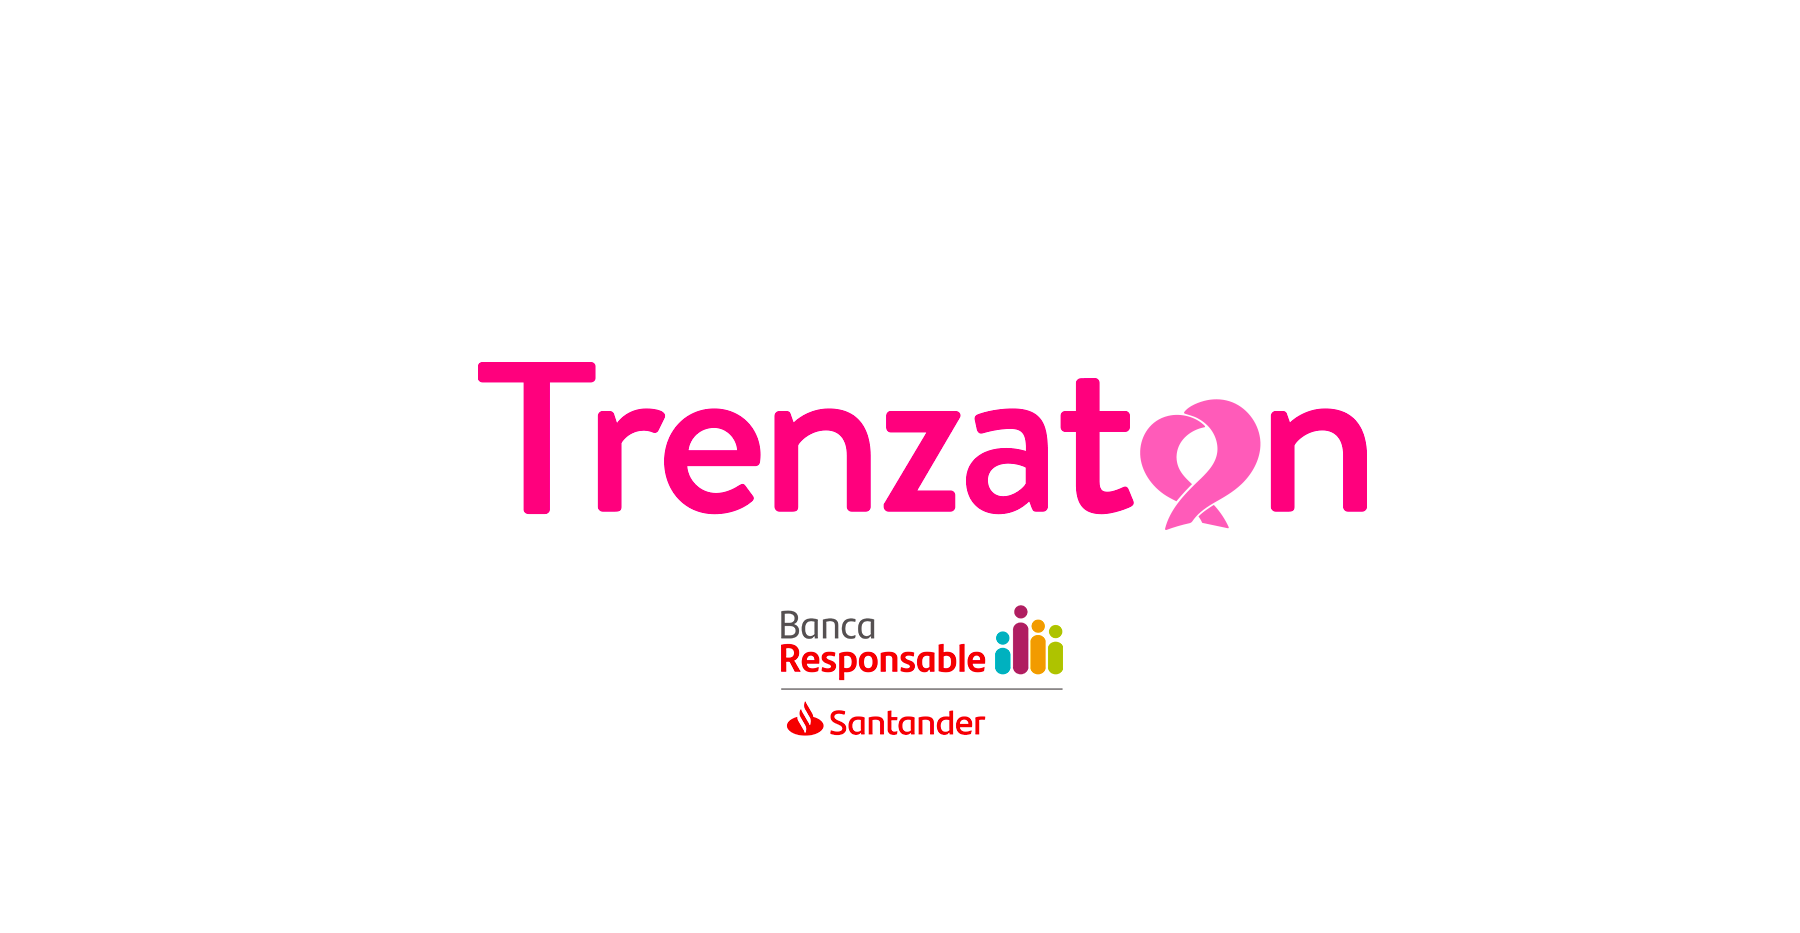 TrenzatonPortadaLogo.png